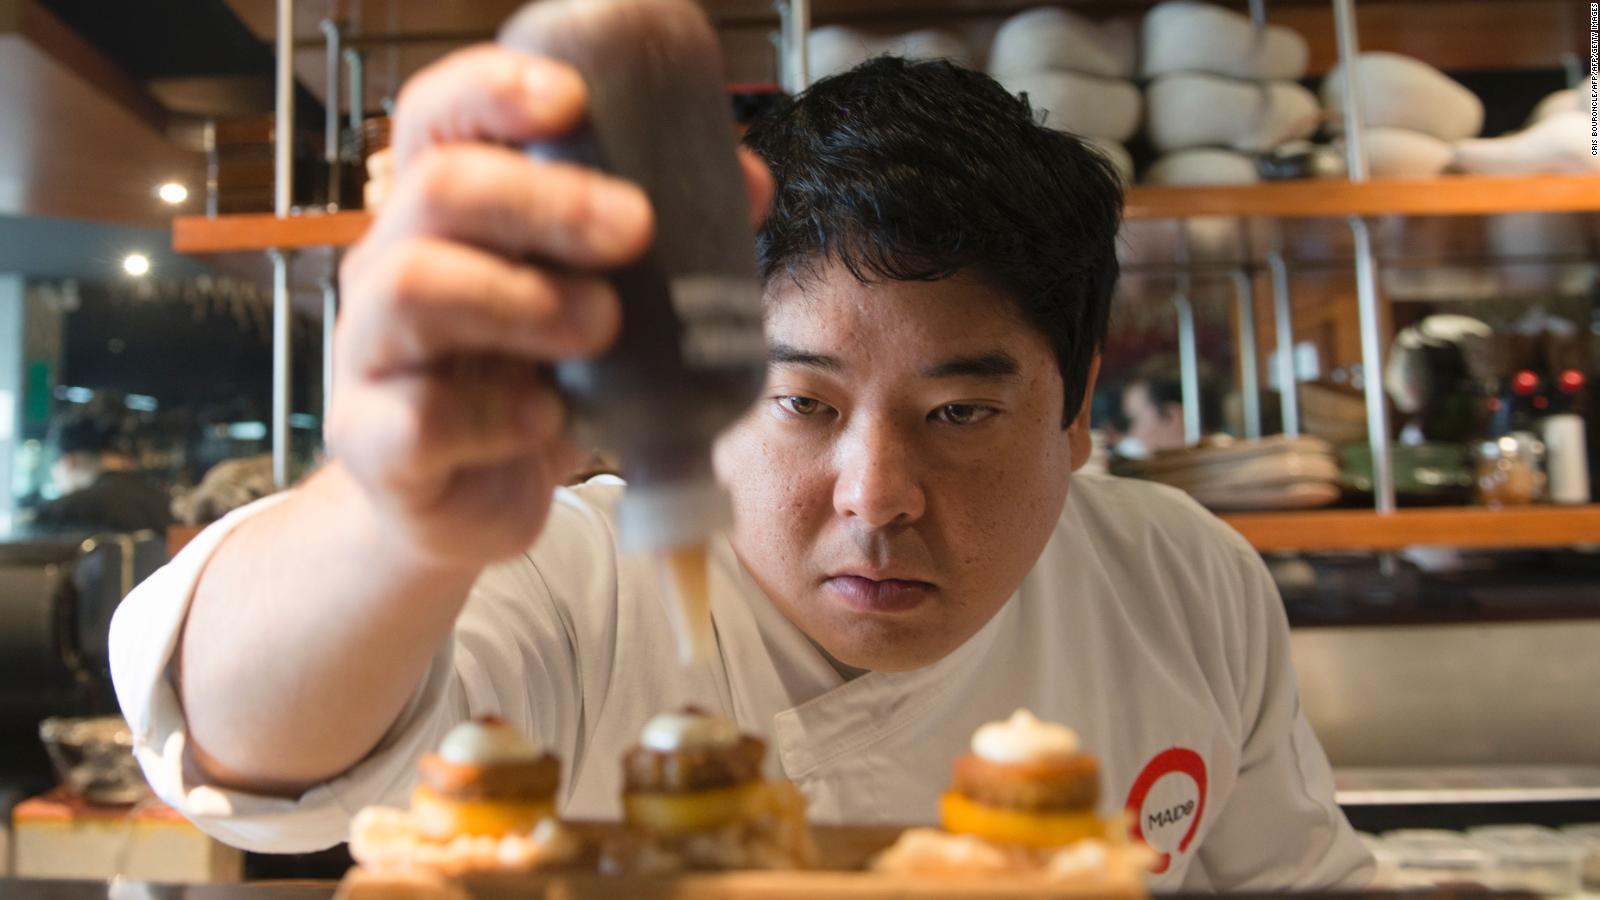 ¿Por qué Perú y México son potencias gastronómicas en América Latina? https://t.co/17Q3vF79RQ https://t.co/QhK1Ldq1uj